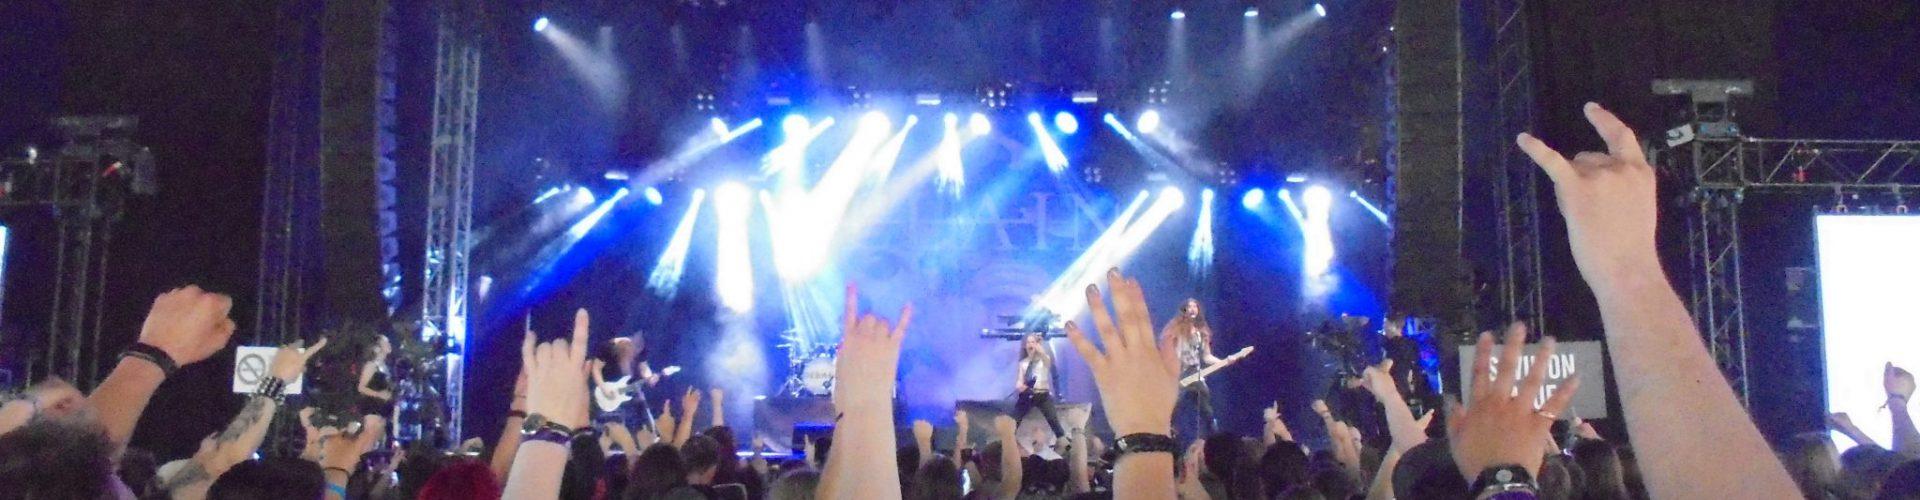 Tuska Festivalbericht